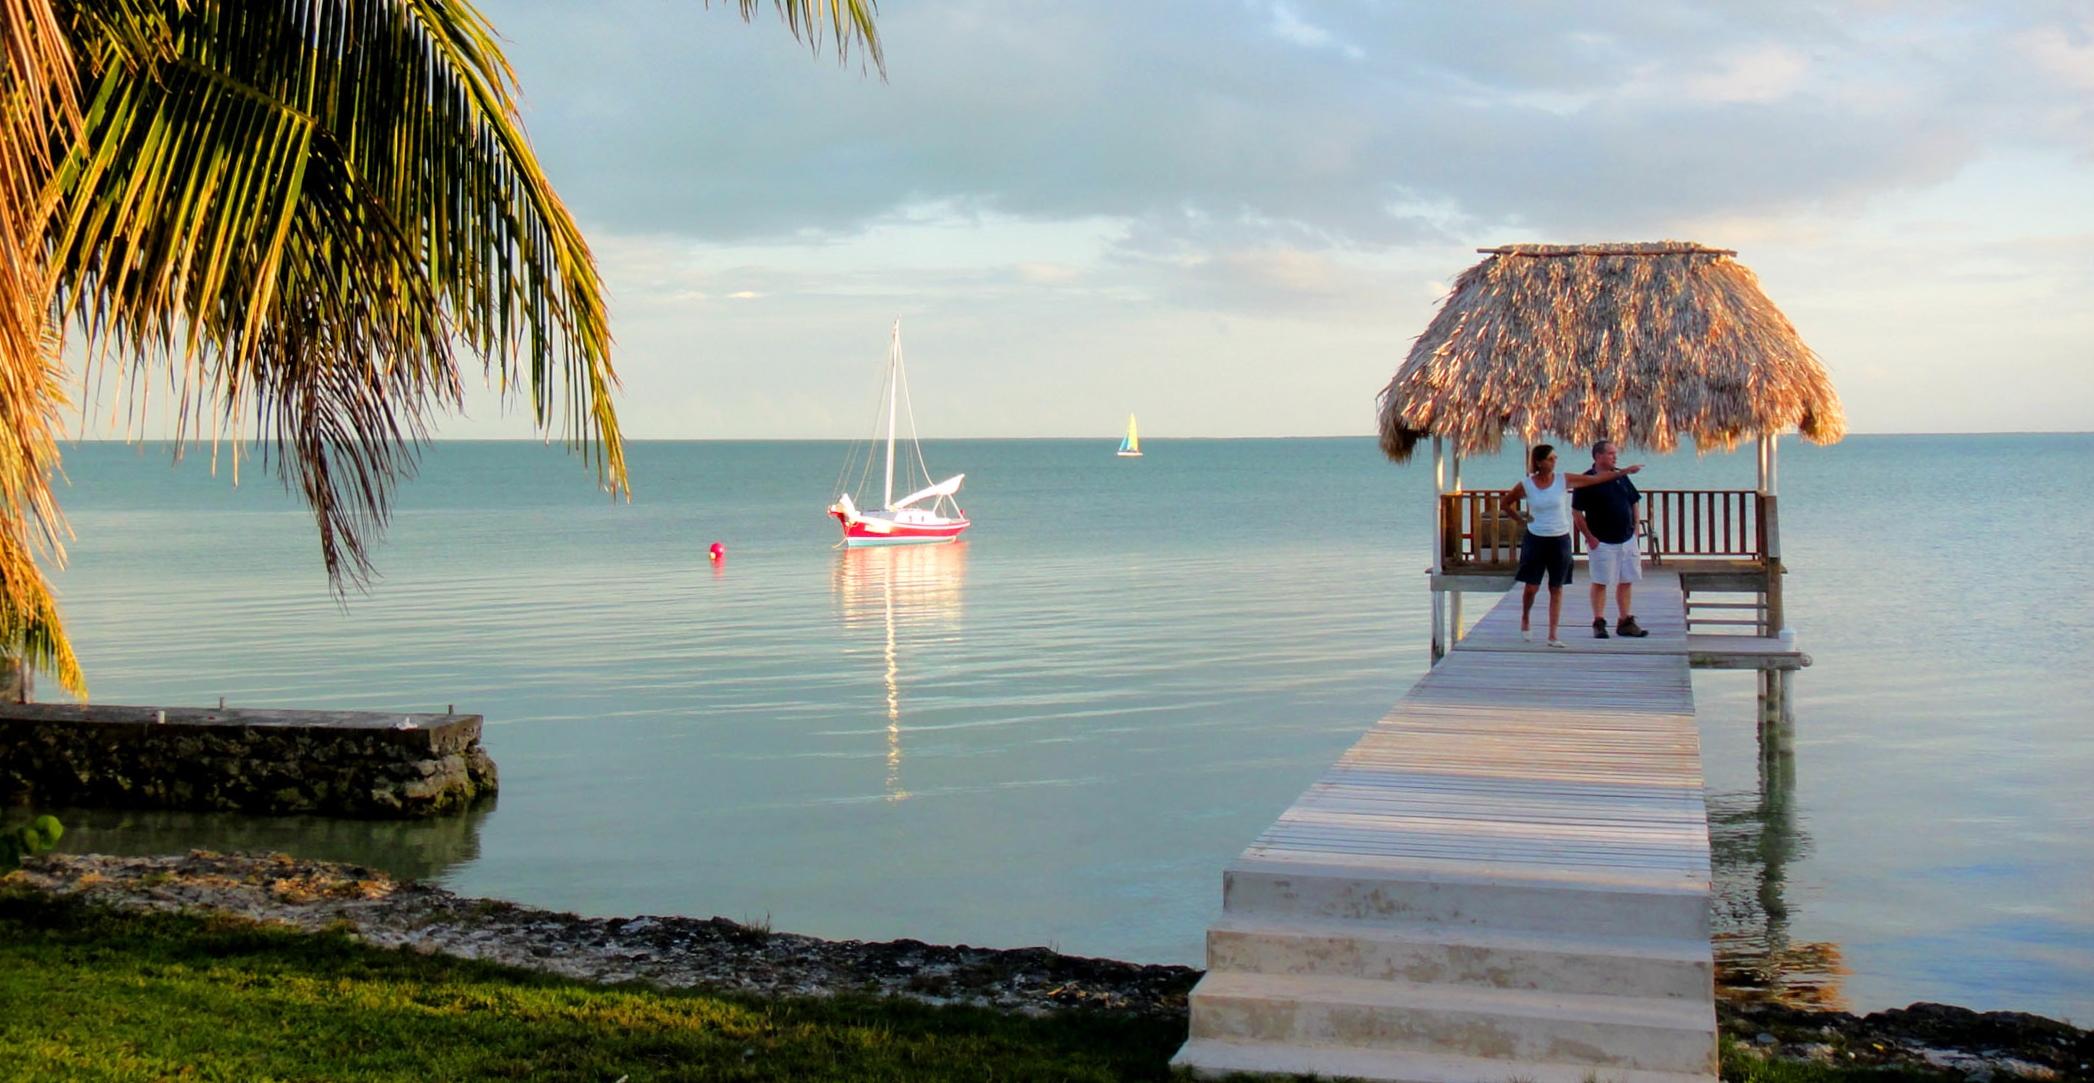 Relaxing on the pier - Consejo Shores, Corozal, Belize